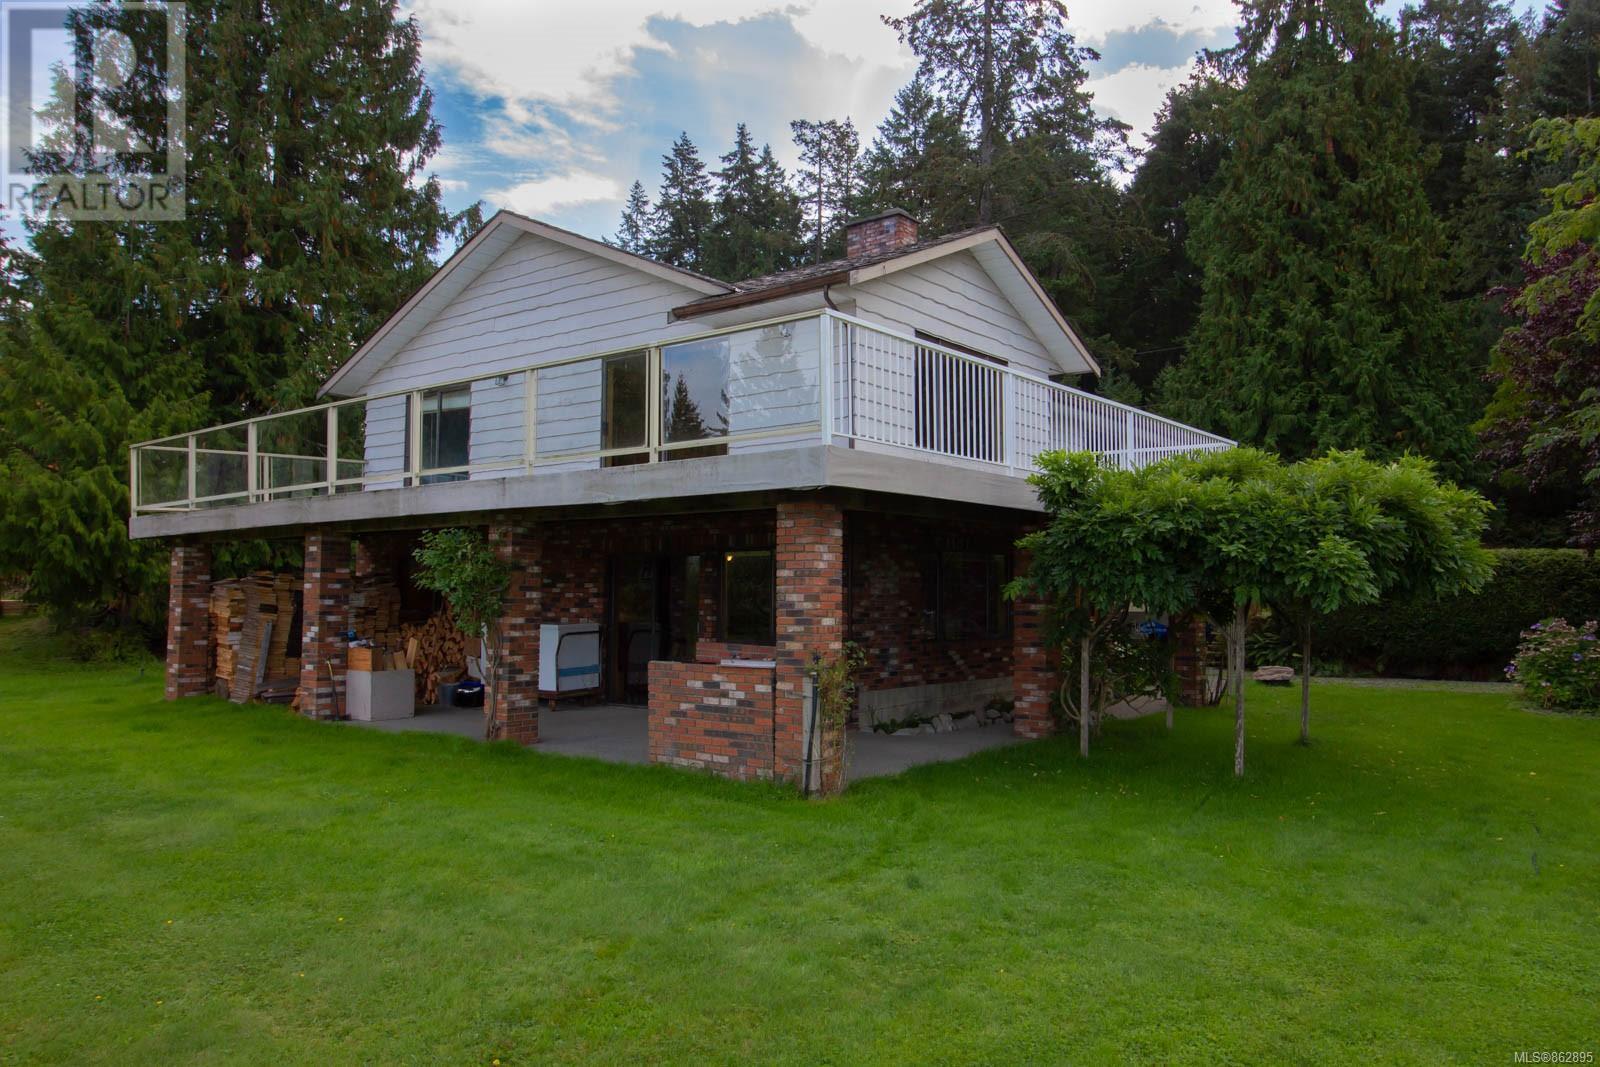 6690 Jenkins Rd, Nanaimo, British Columbia  V9T 6G8 - Photo 1 - 862895